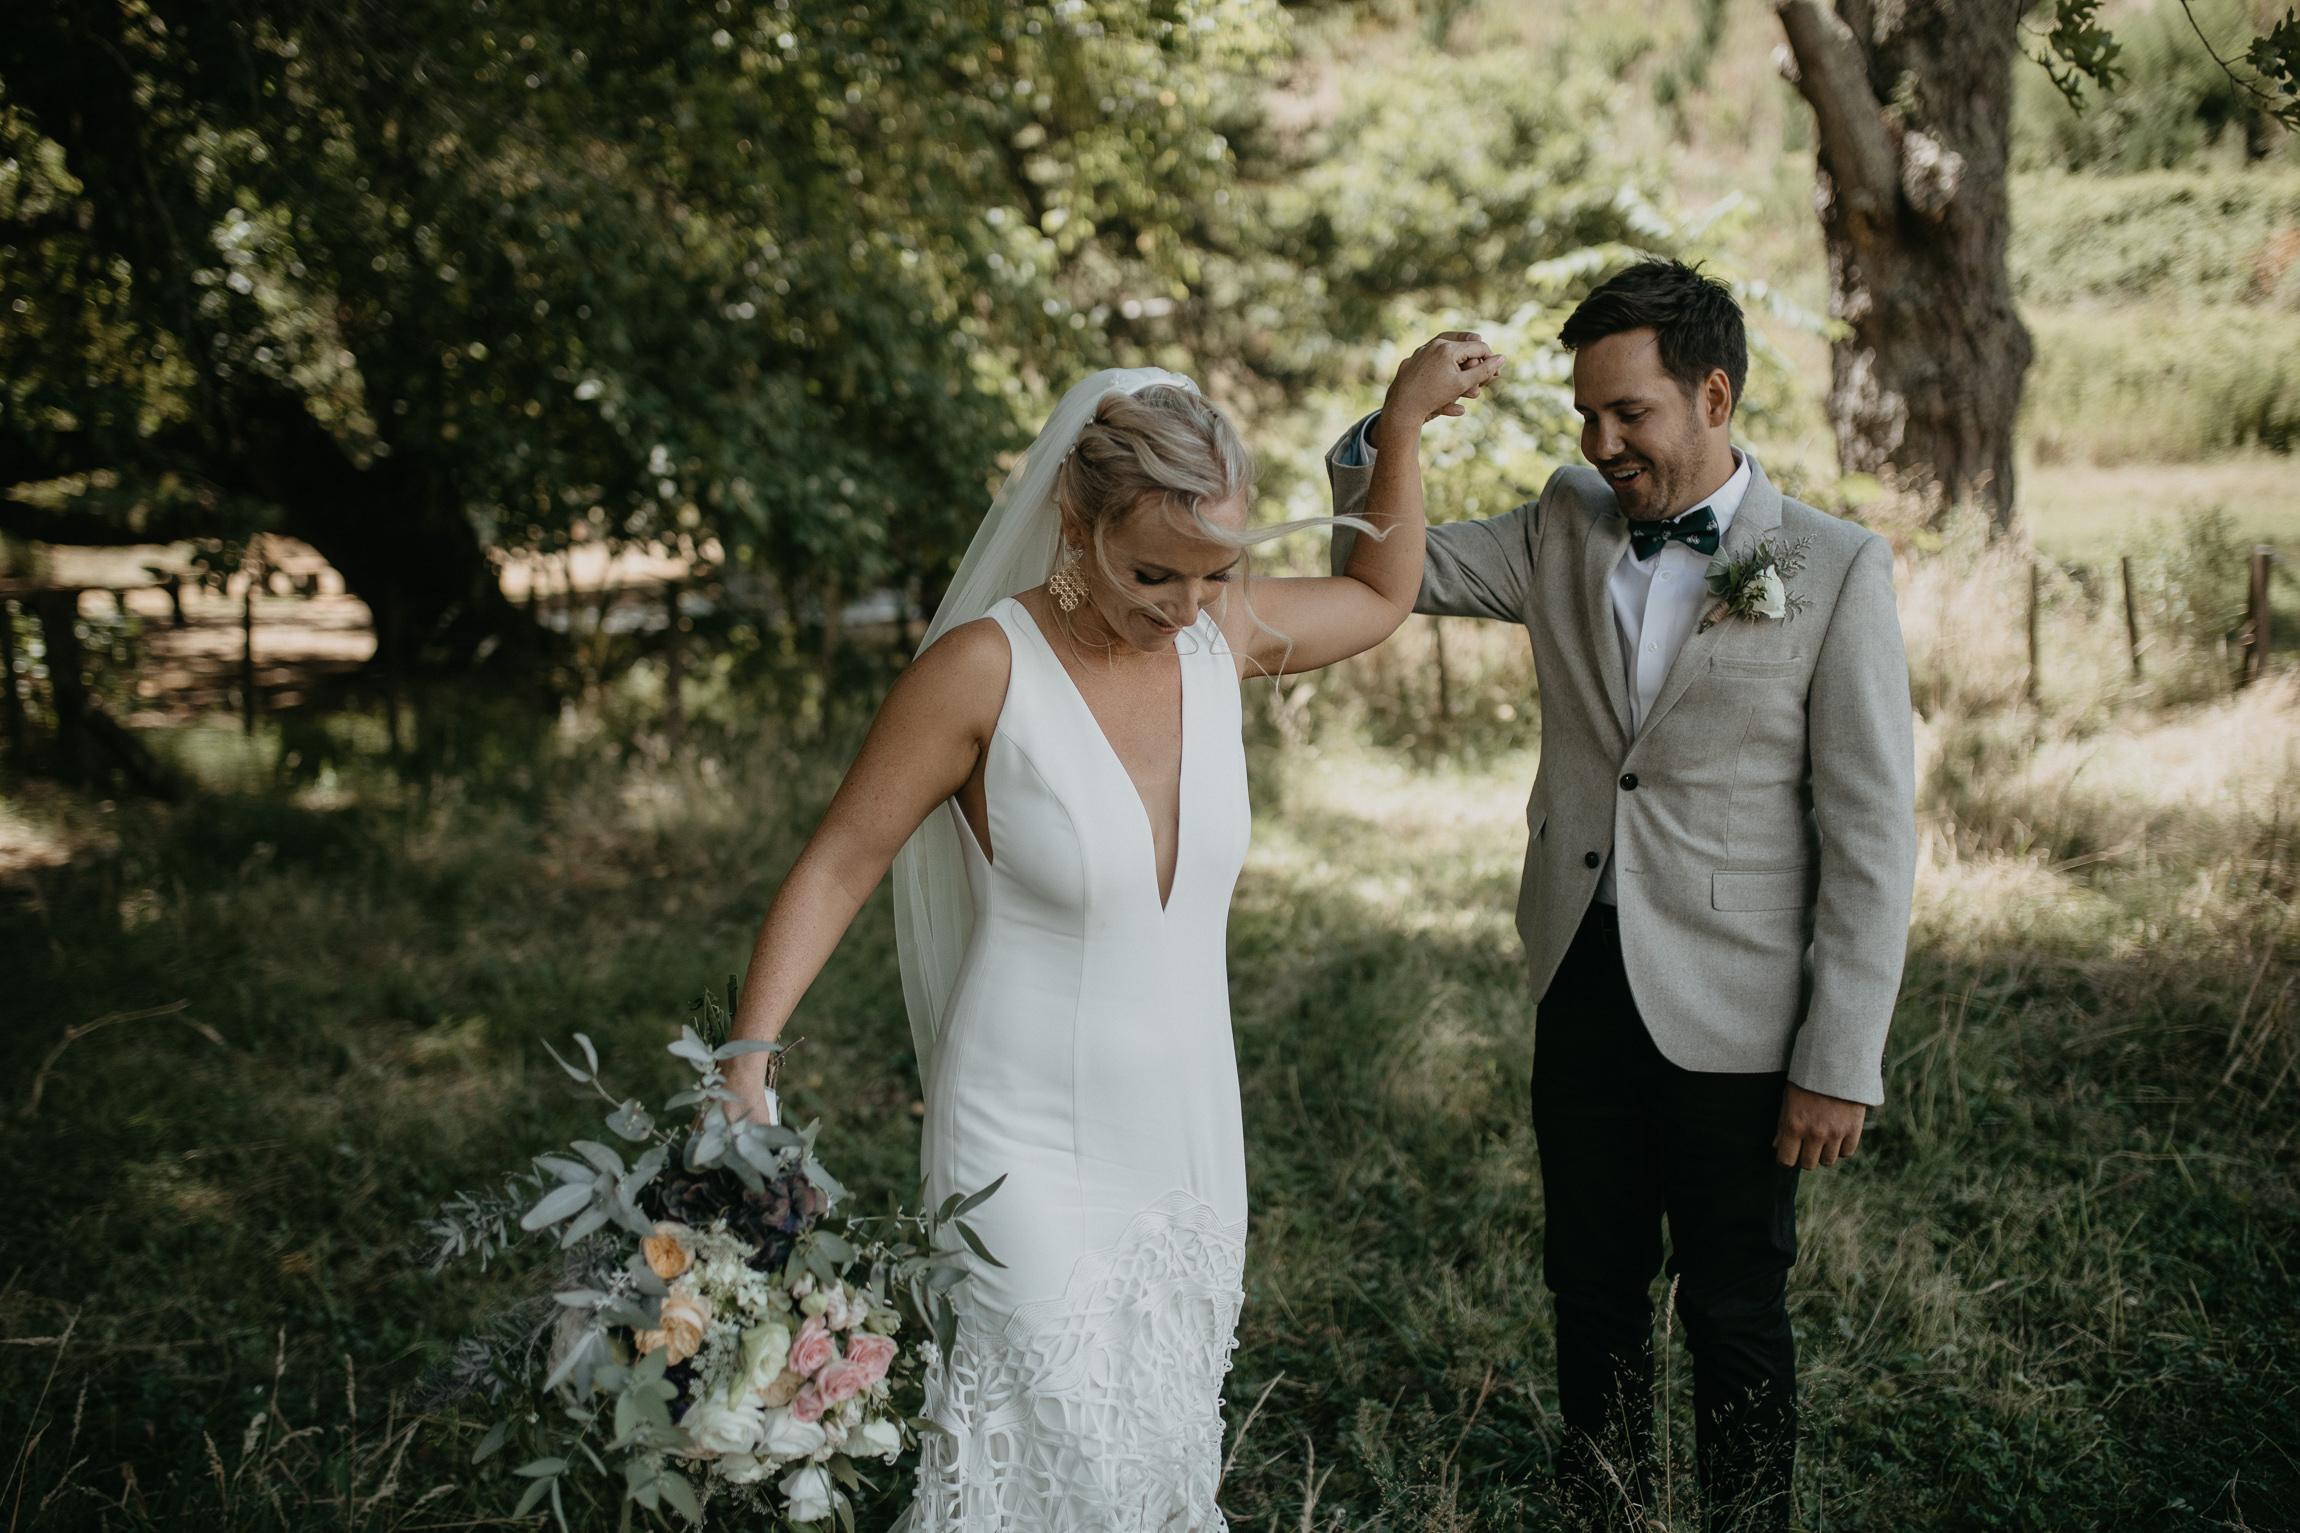 oldforestschool-wedding-blog-55.jpg